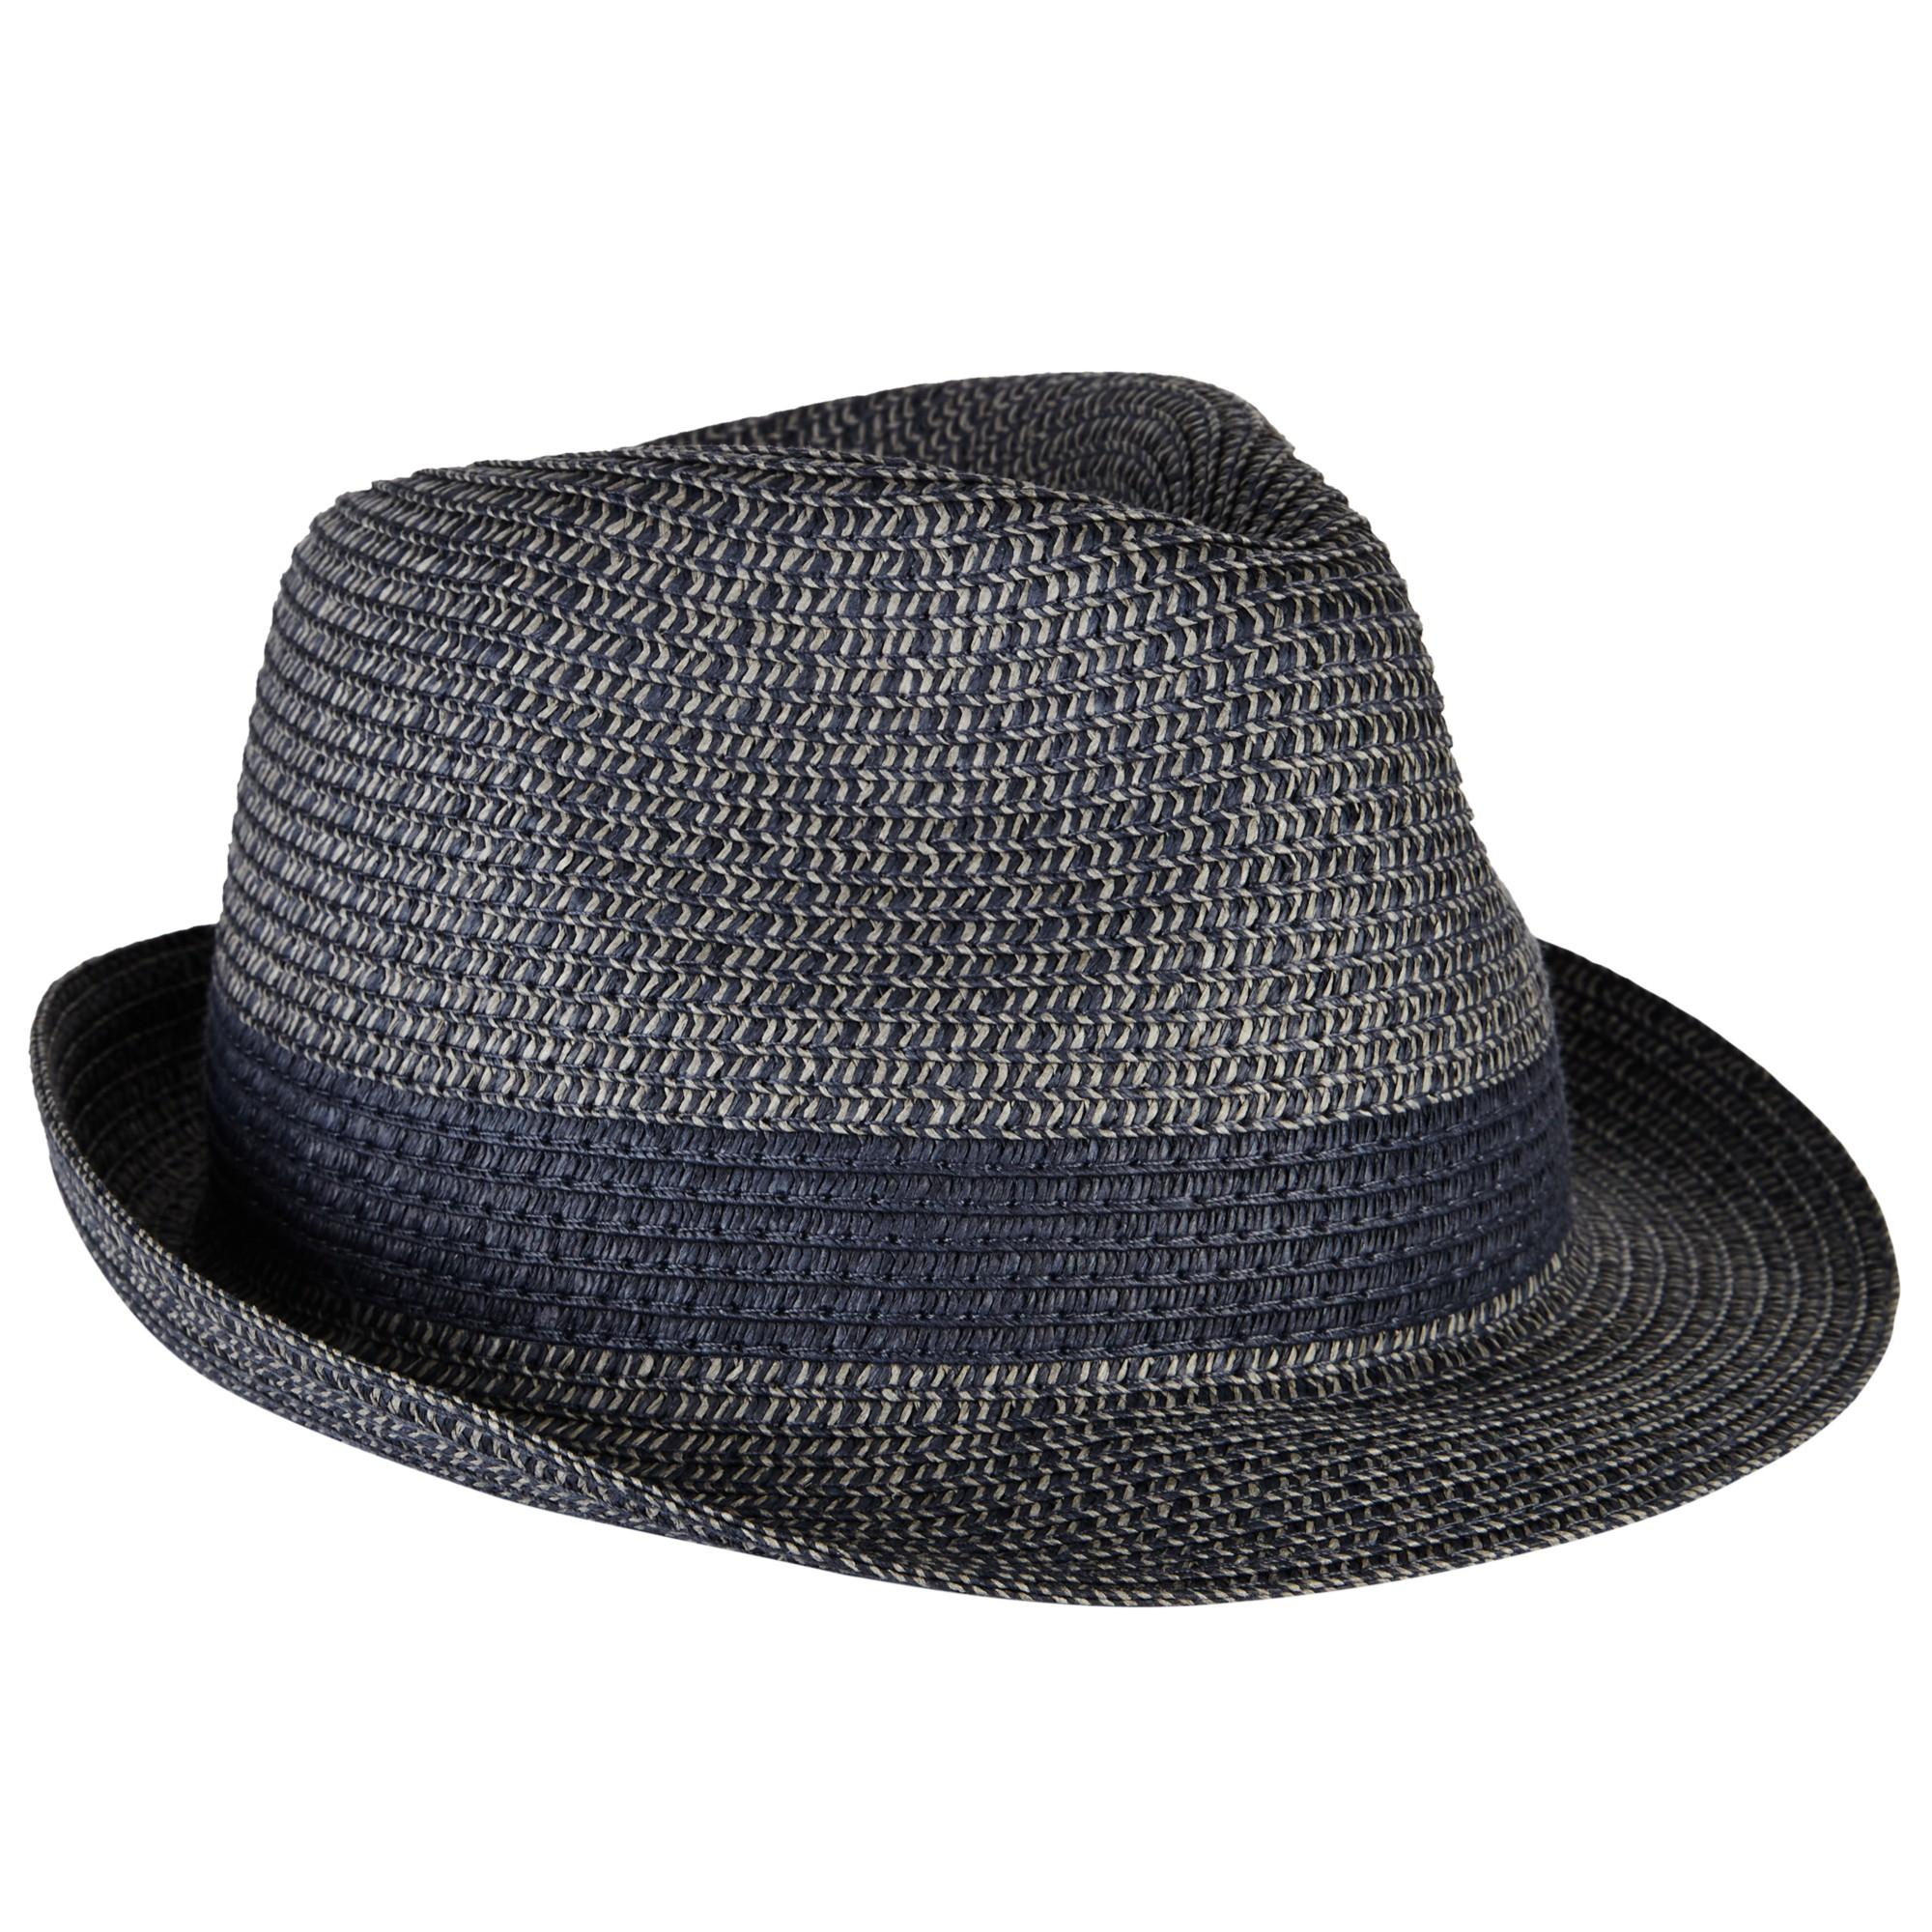 John Lewis Packable Braid Trilby Hat in Black for Men - Lyst bafb551e8237